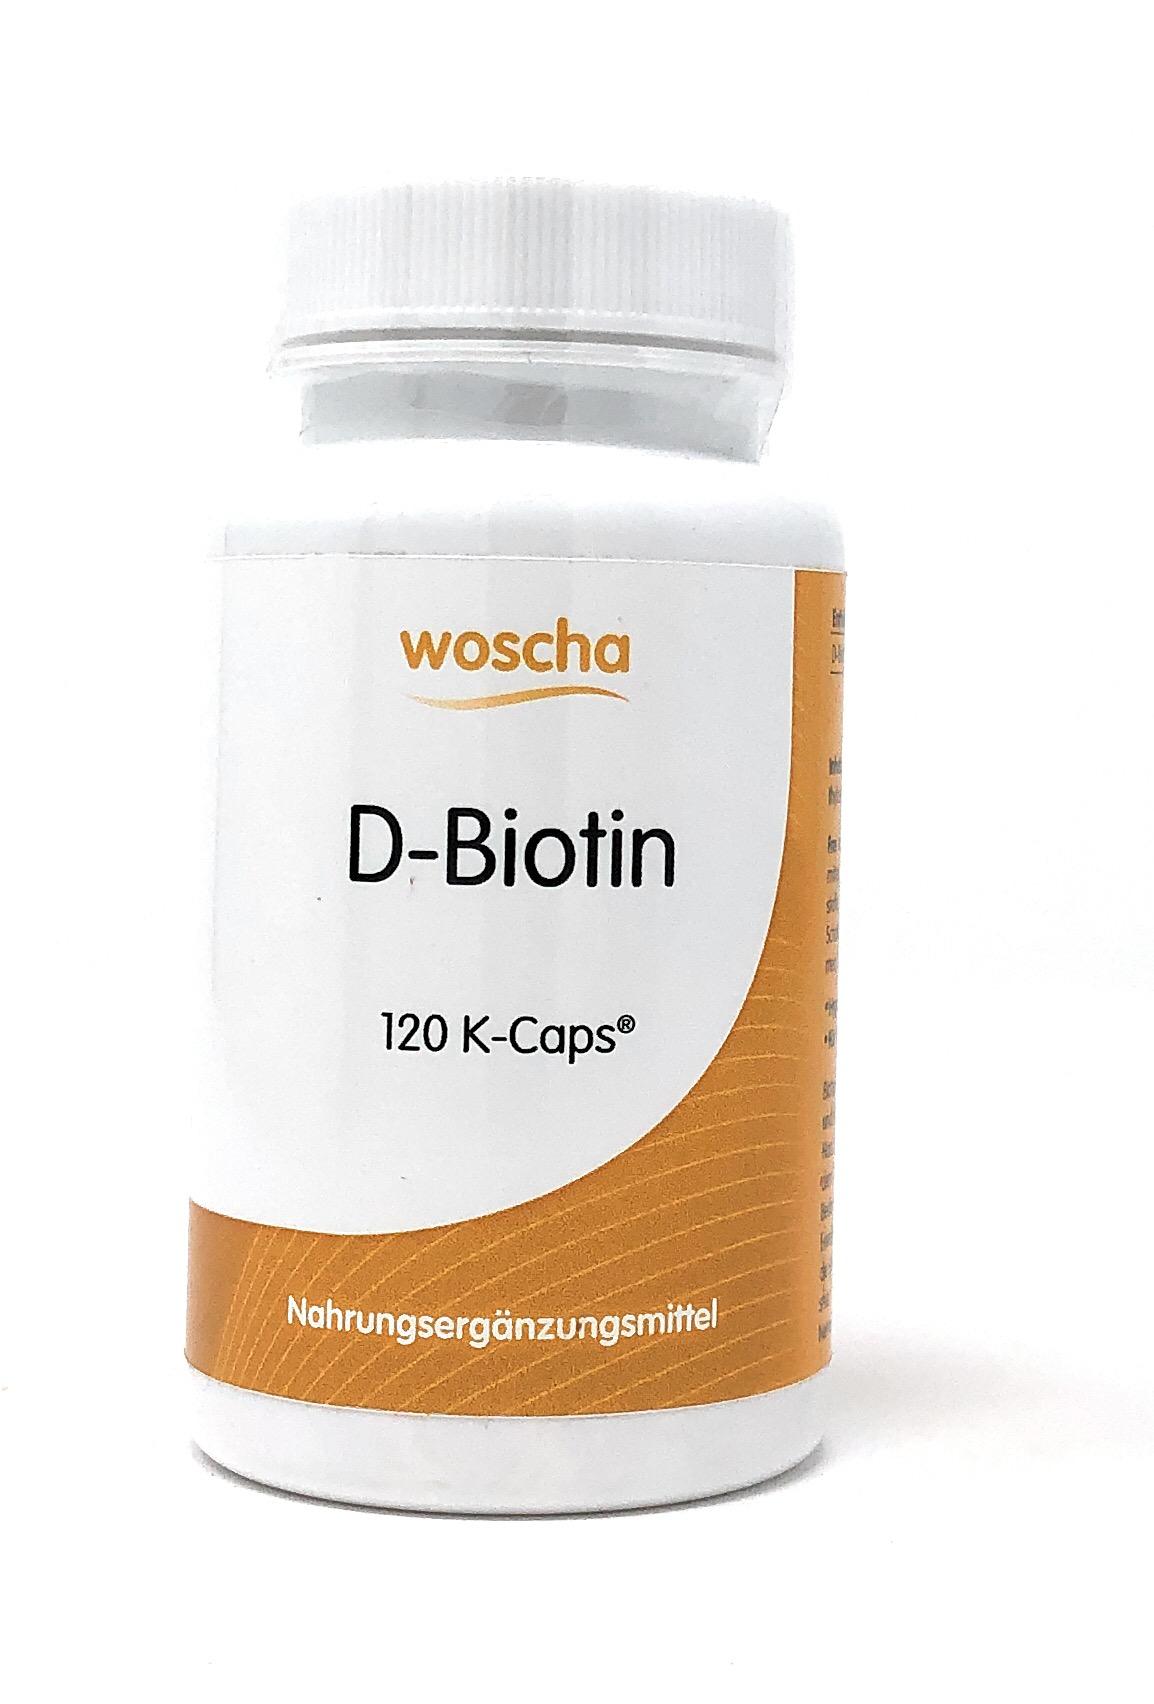 woscha D-Biotin 120 K-Caps (46g) (vegan)